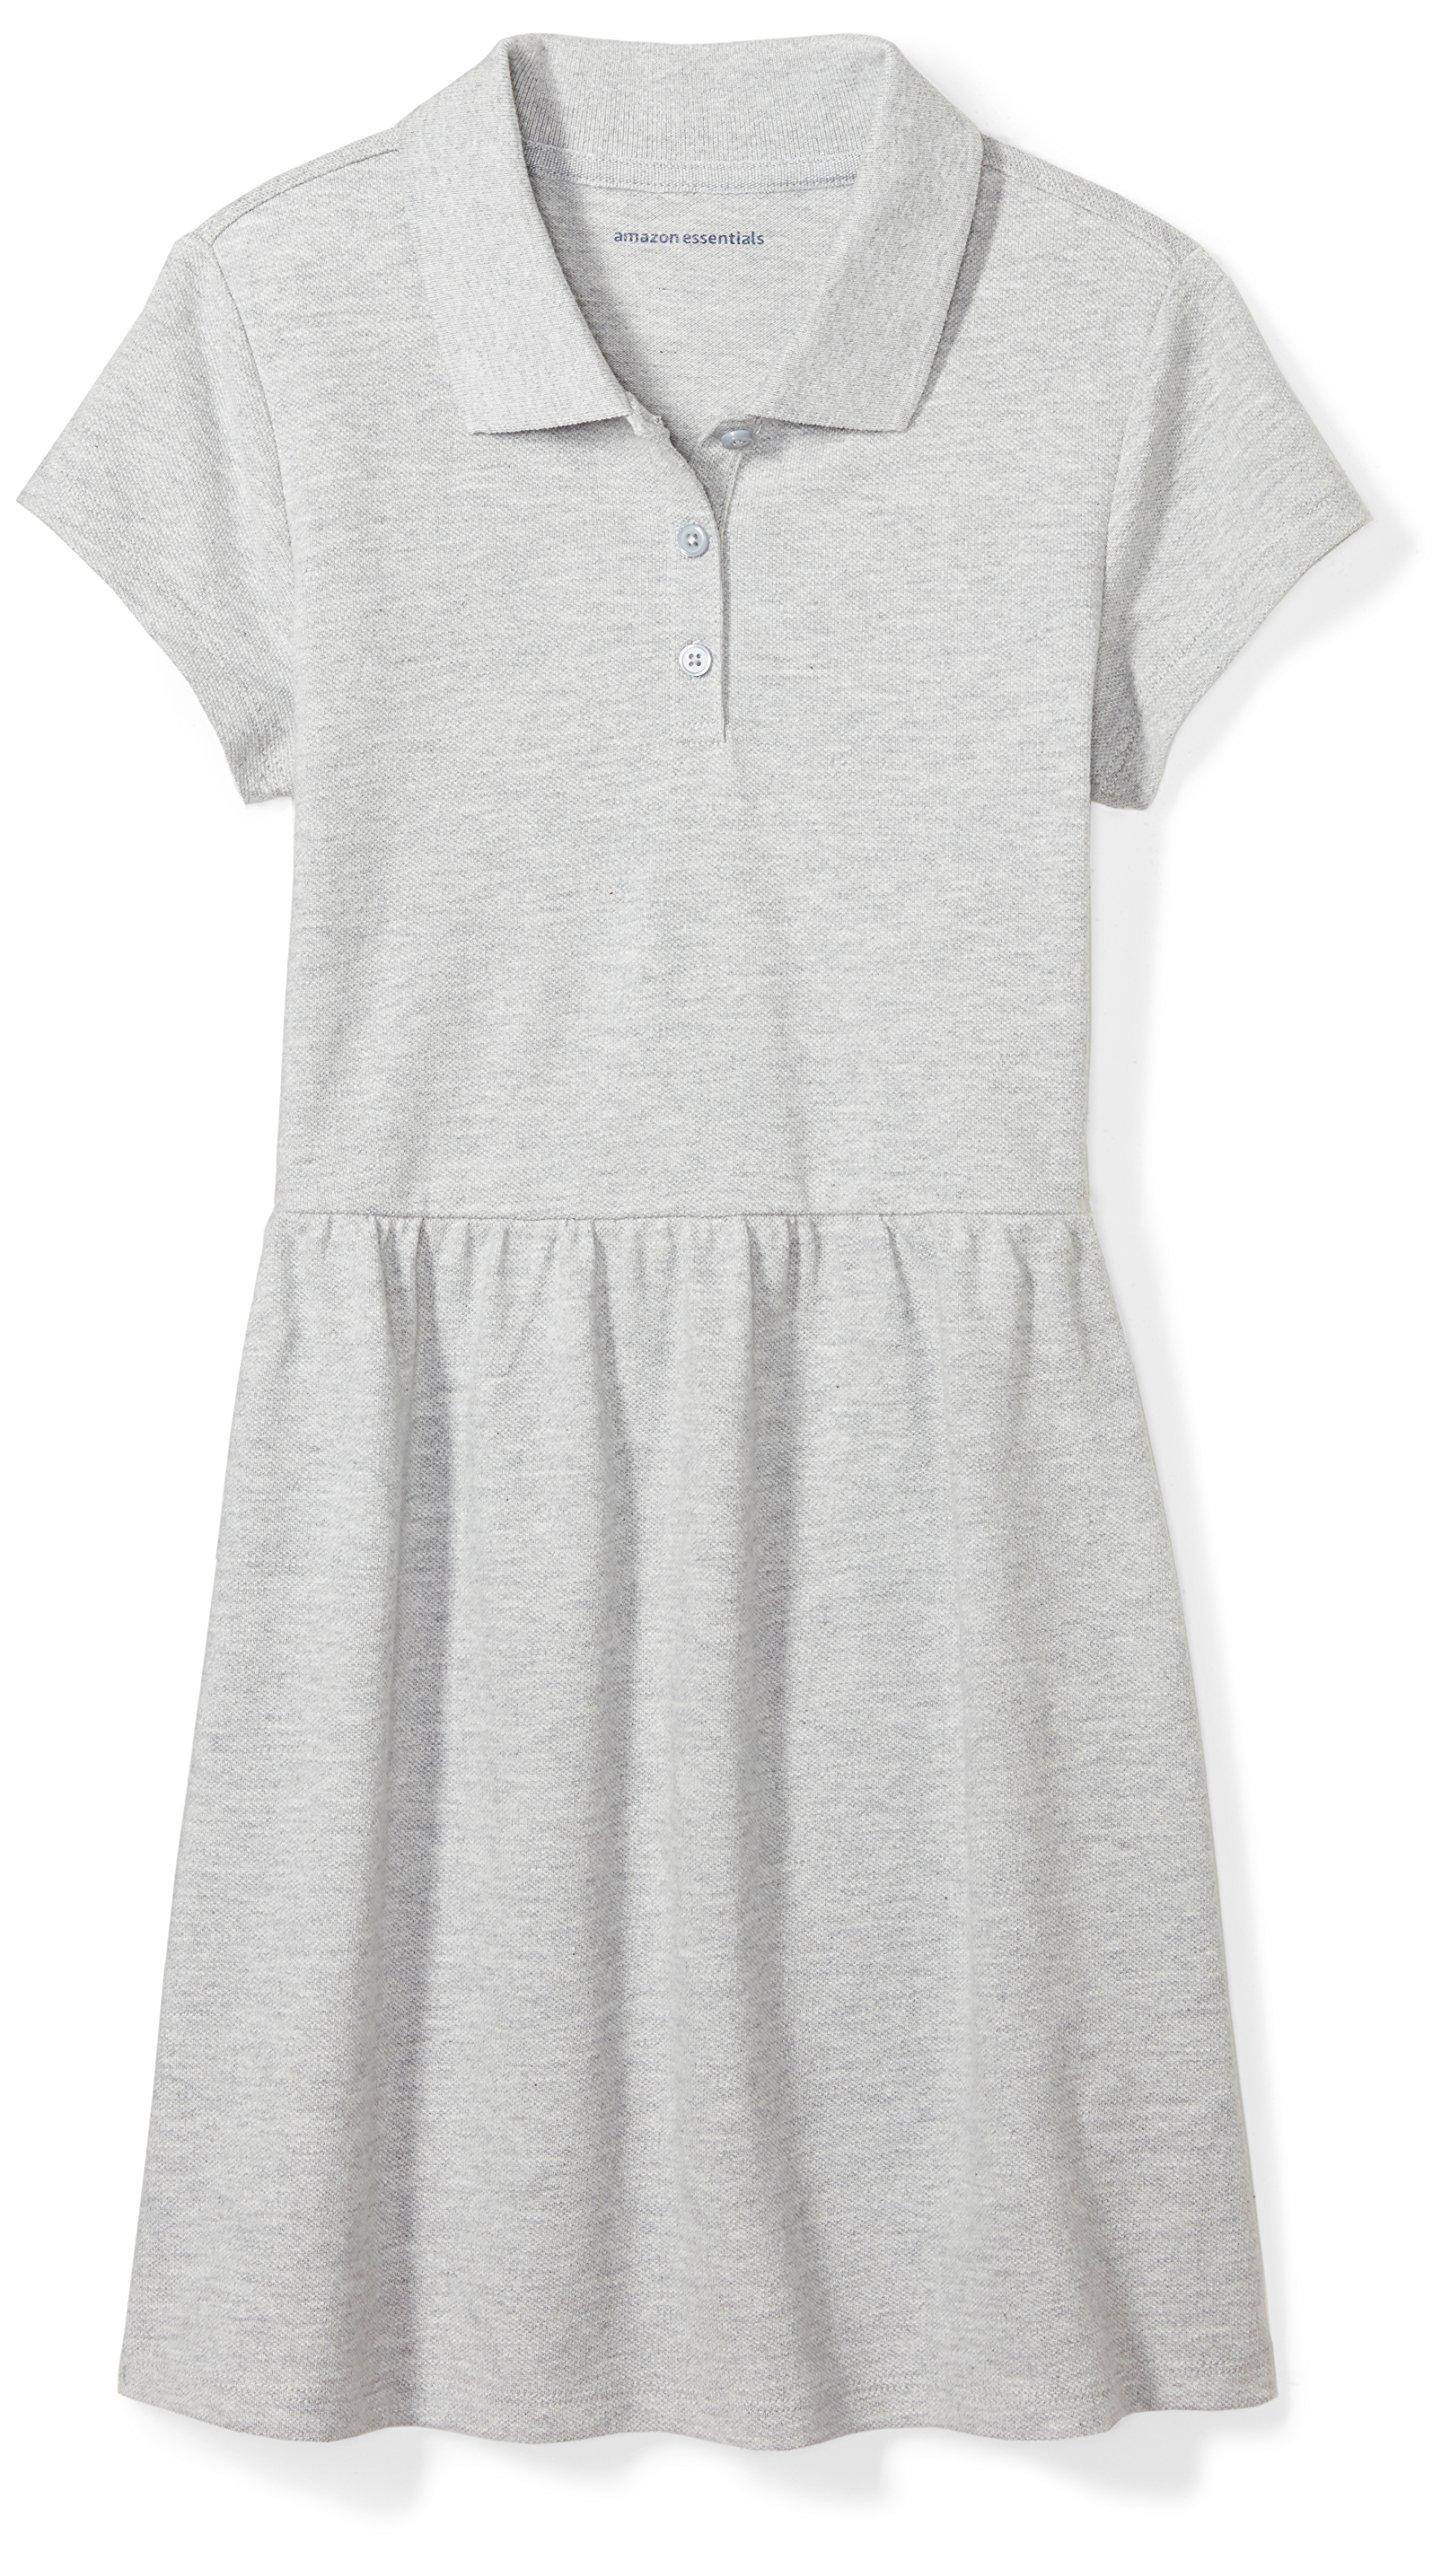 Amazon Essentials Girls' Short-Sleeve Polo Dress, Gray, M (8) by Amazon Essentials (Image #1)